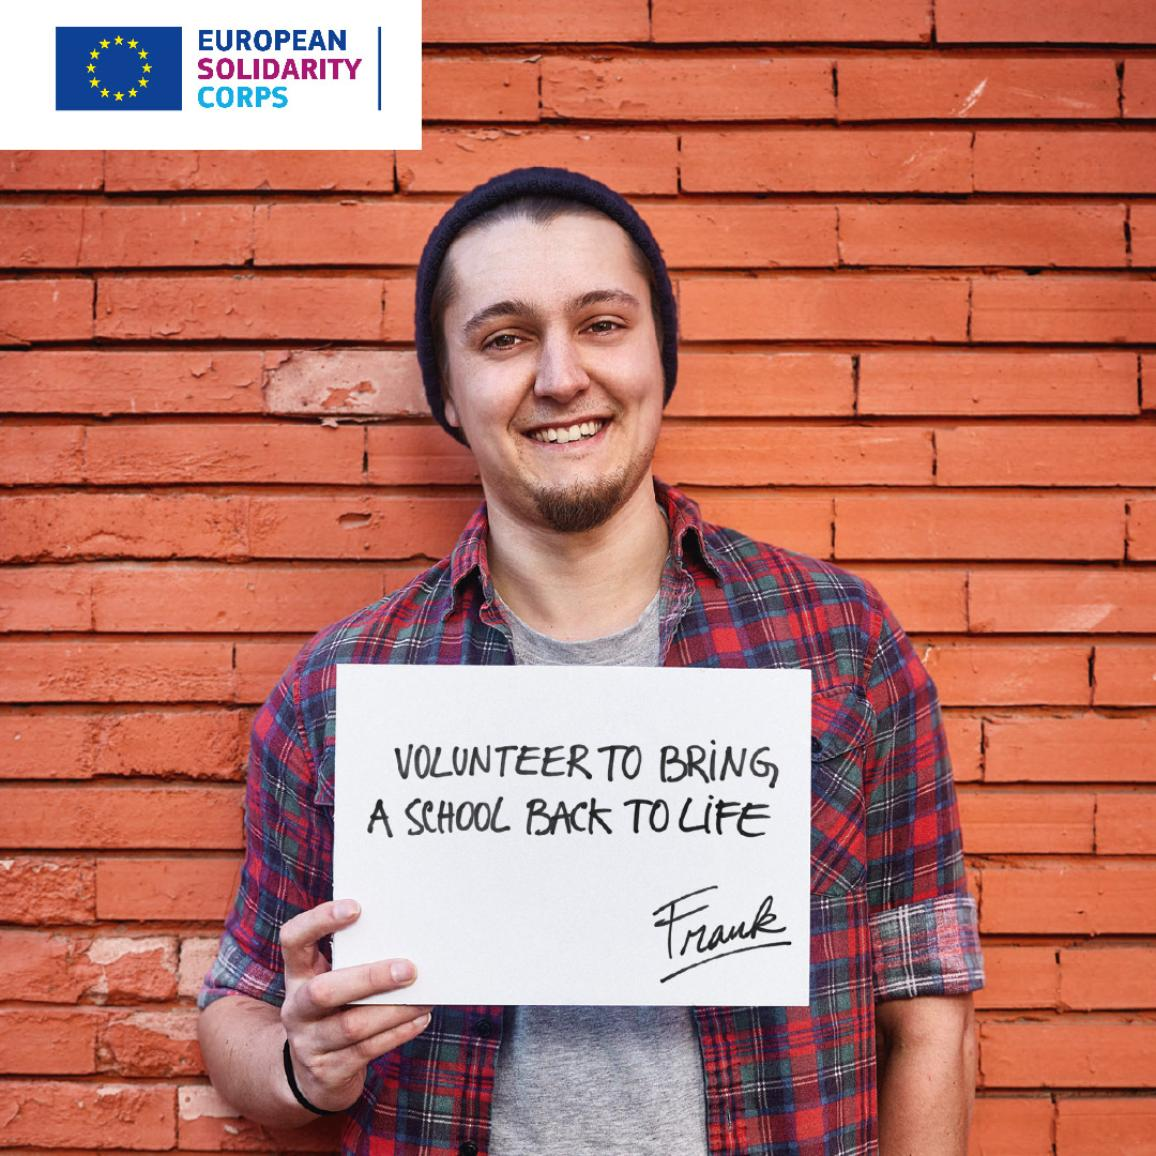 European Solidarity Corps illustration image